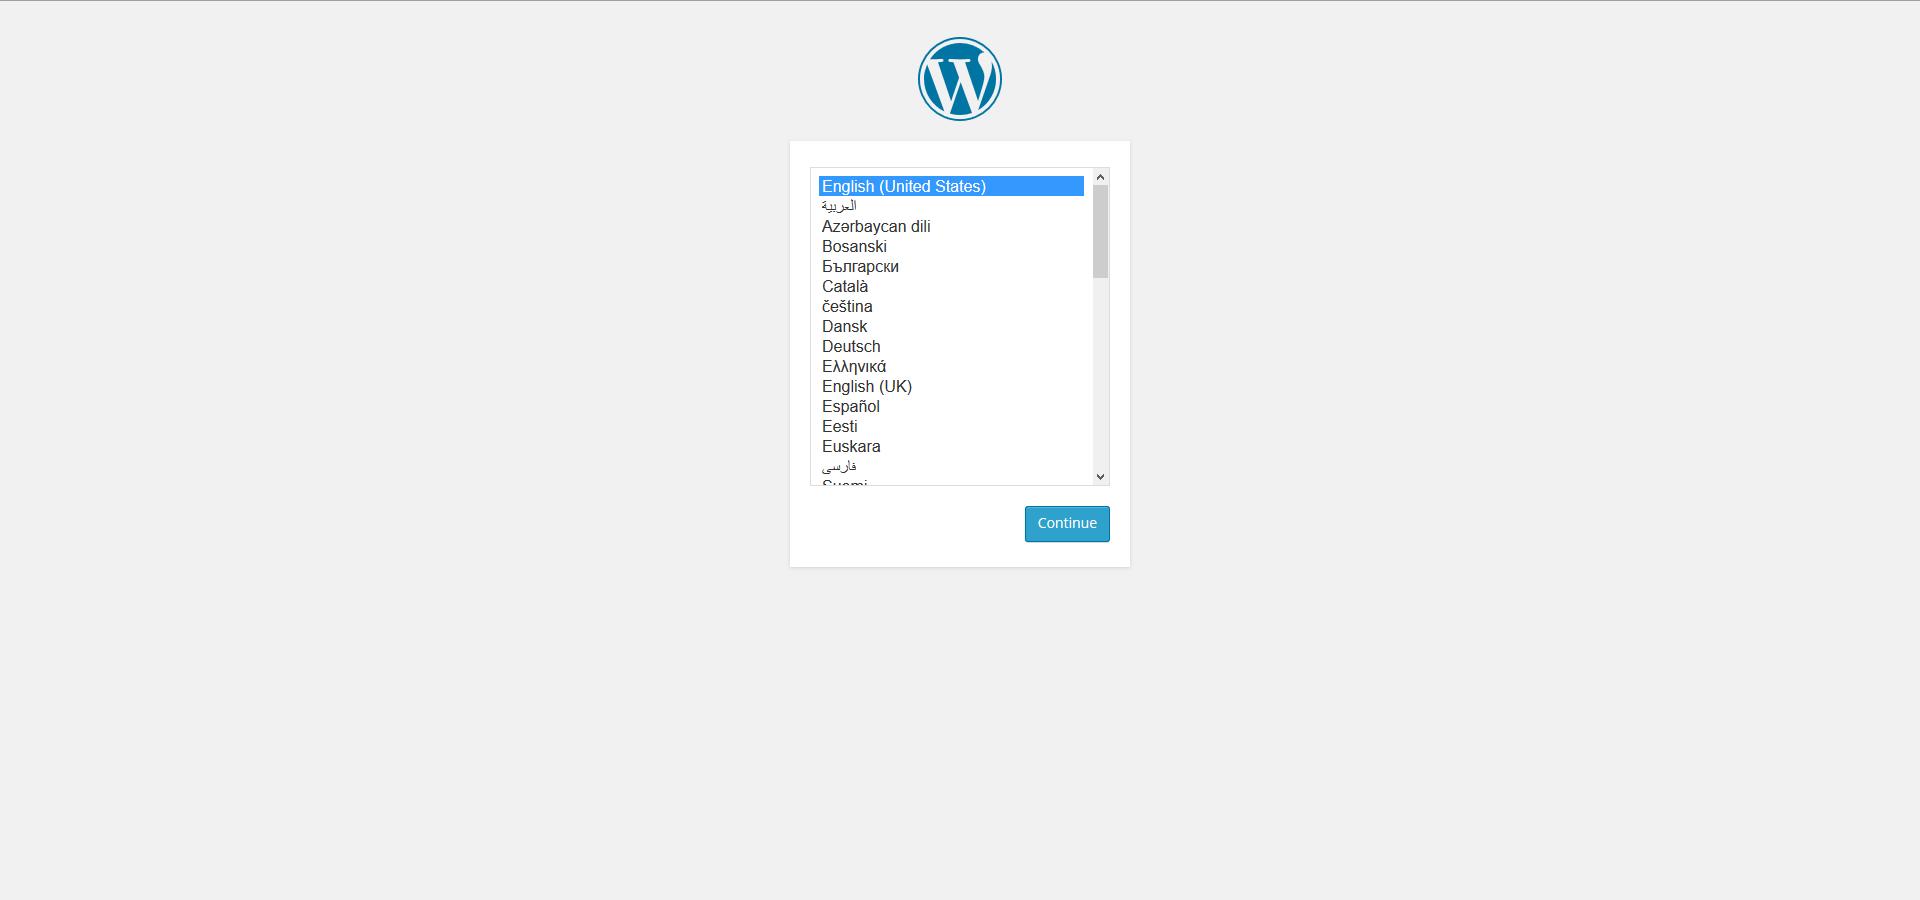 wordpress-4.0-beta-01